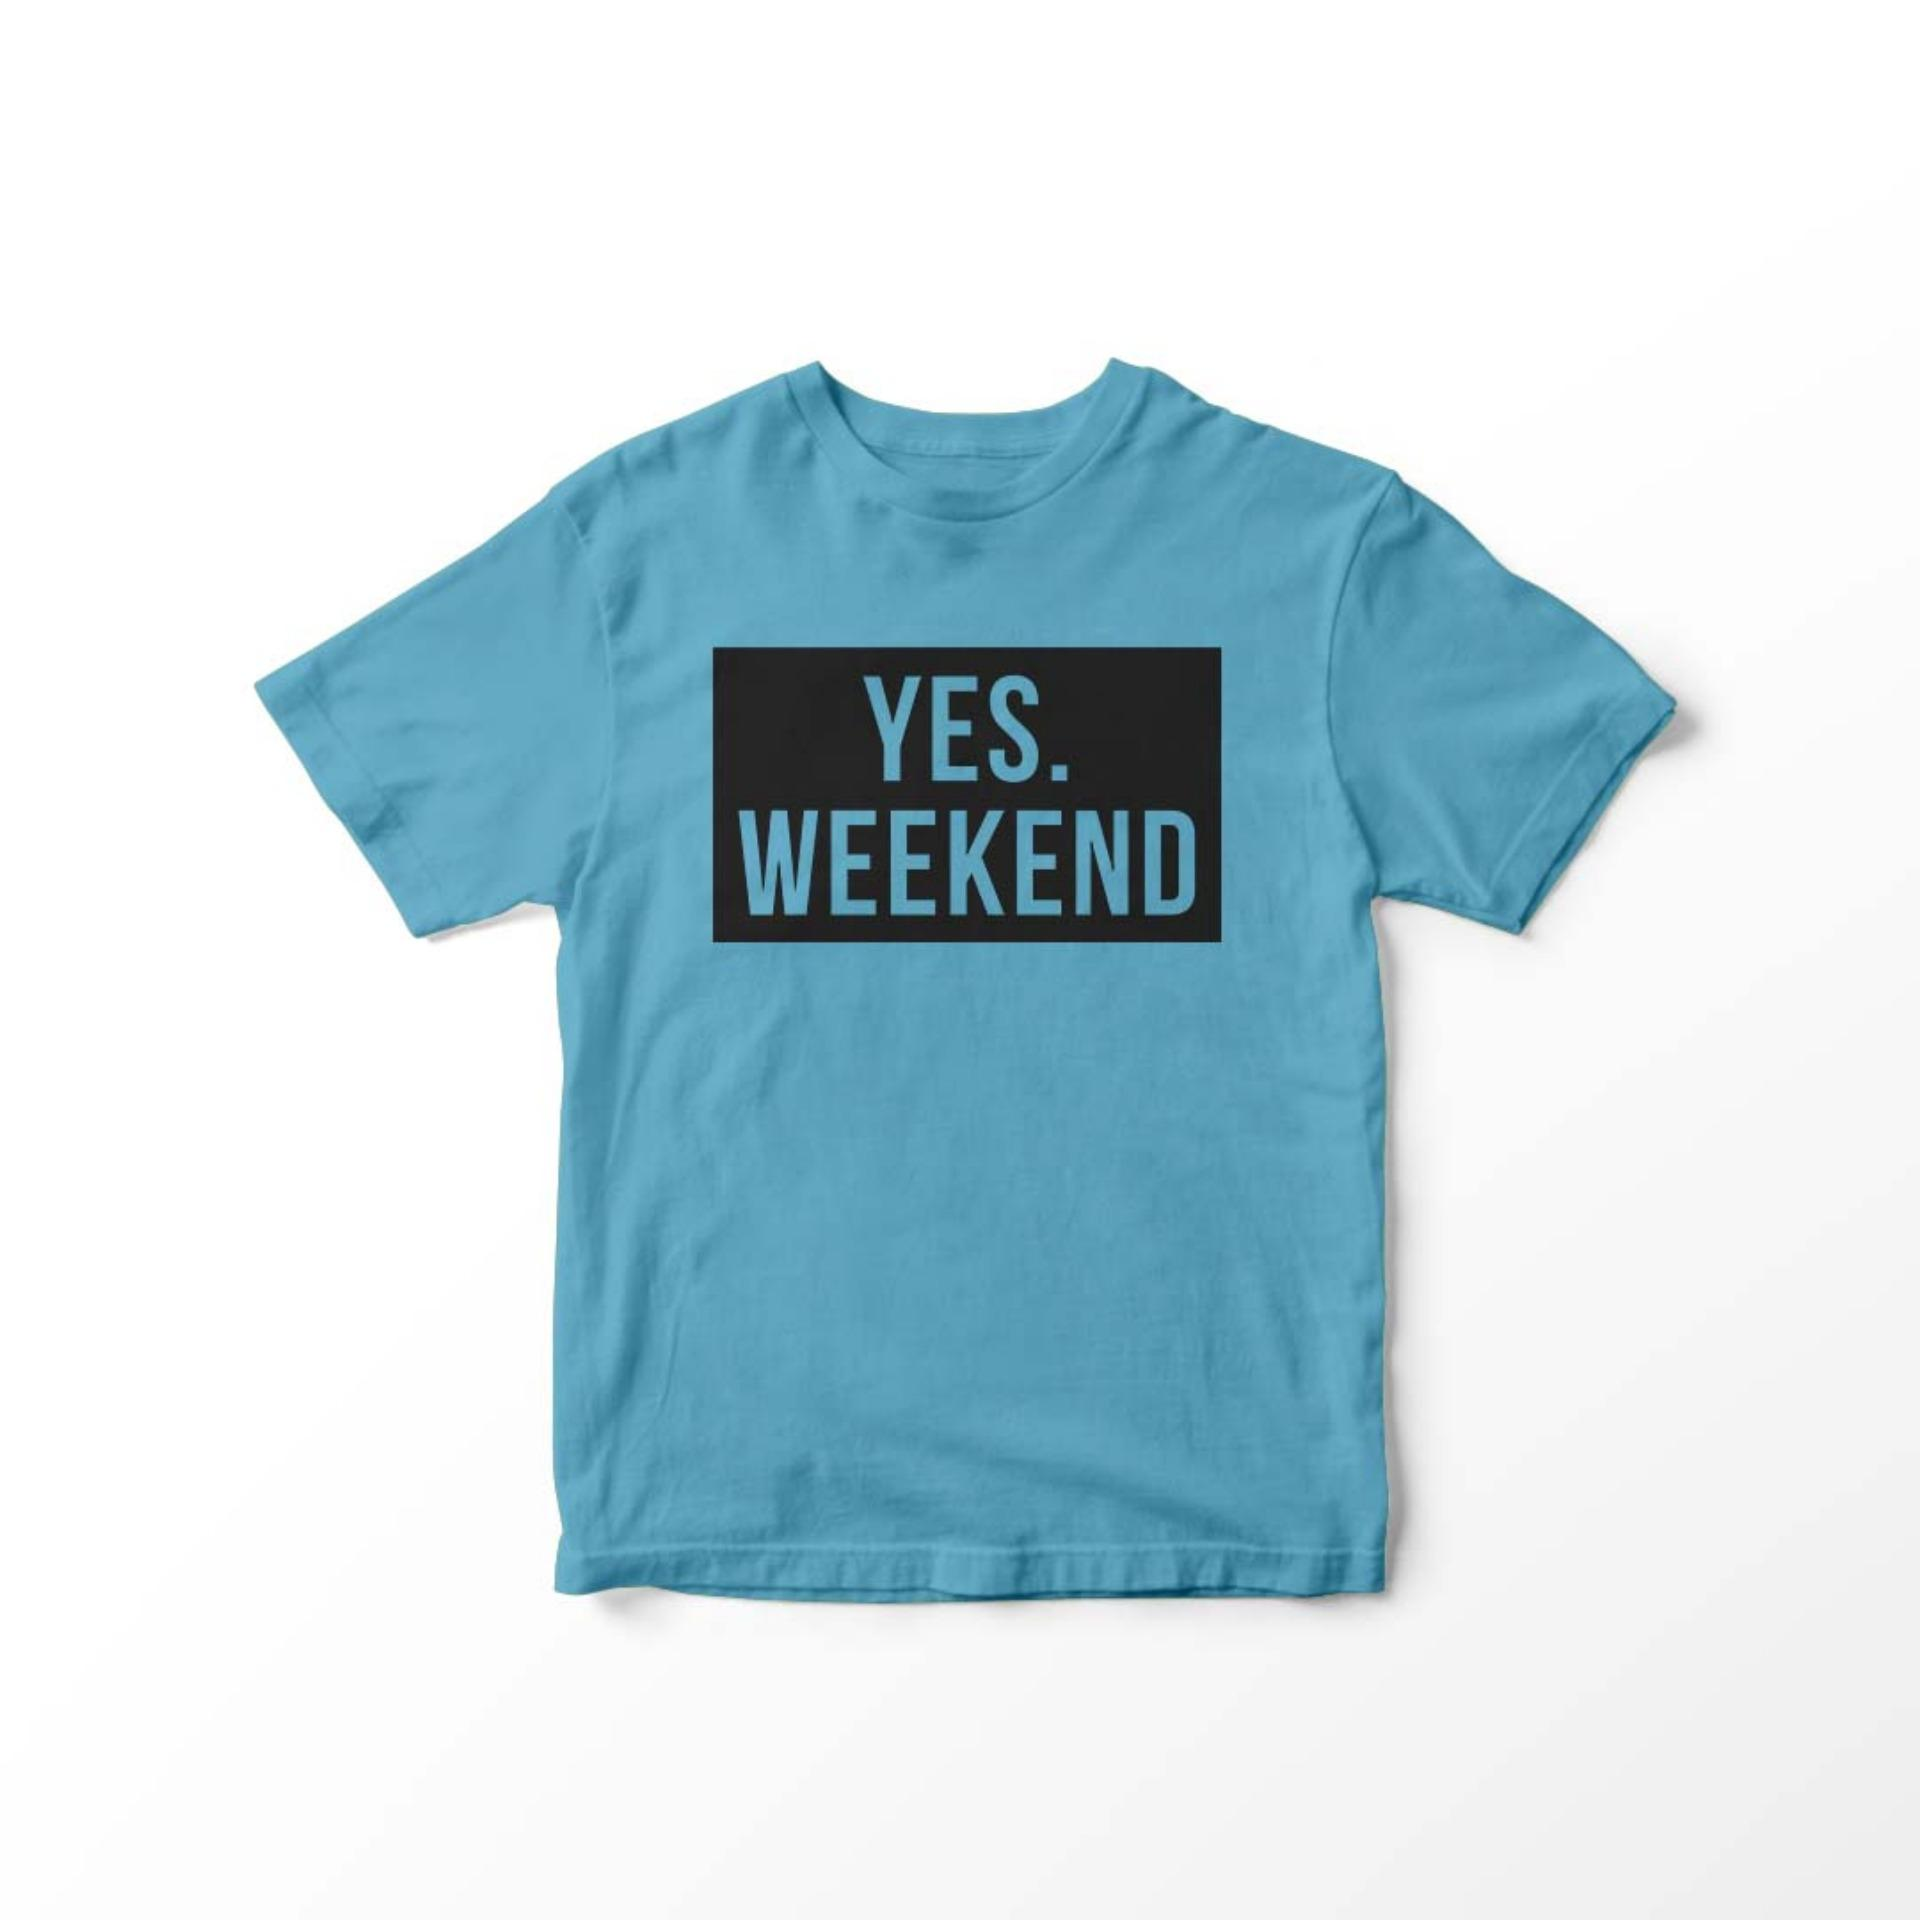 POLARISSHIRT - Baju Kaos T-shirt YES WEEKEND Tumblr Tee Cewek / Kaos Wanita /